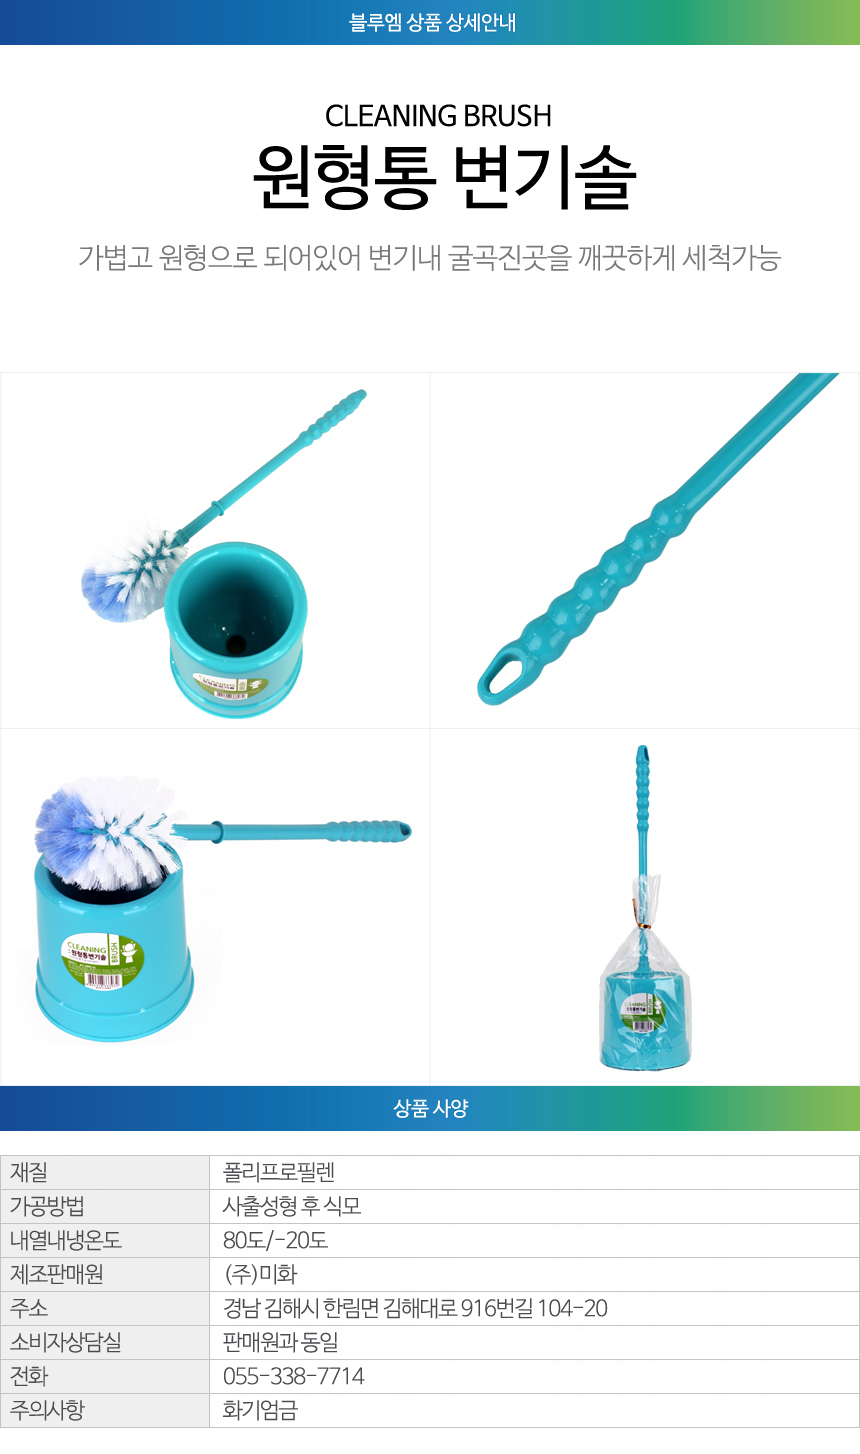 circletongbrush.JPG